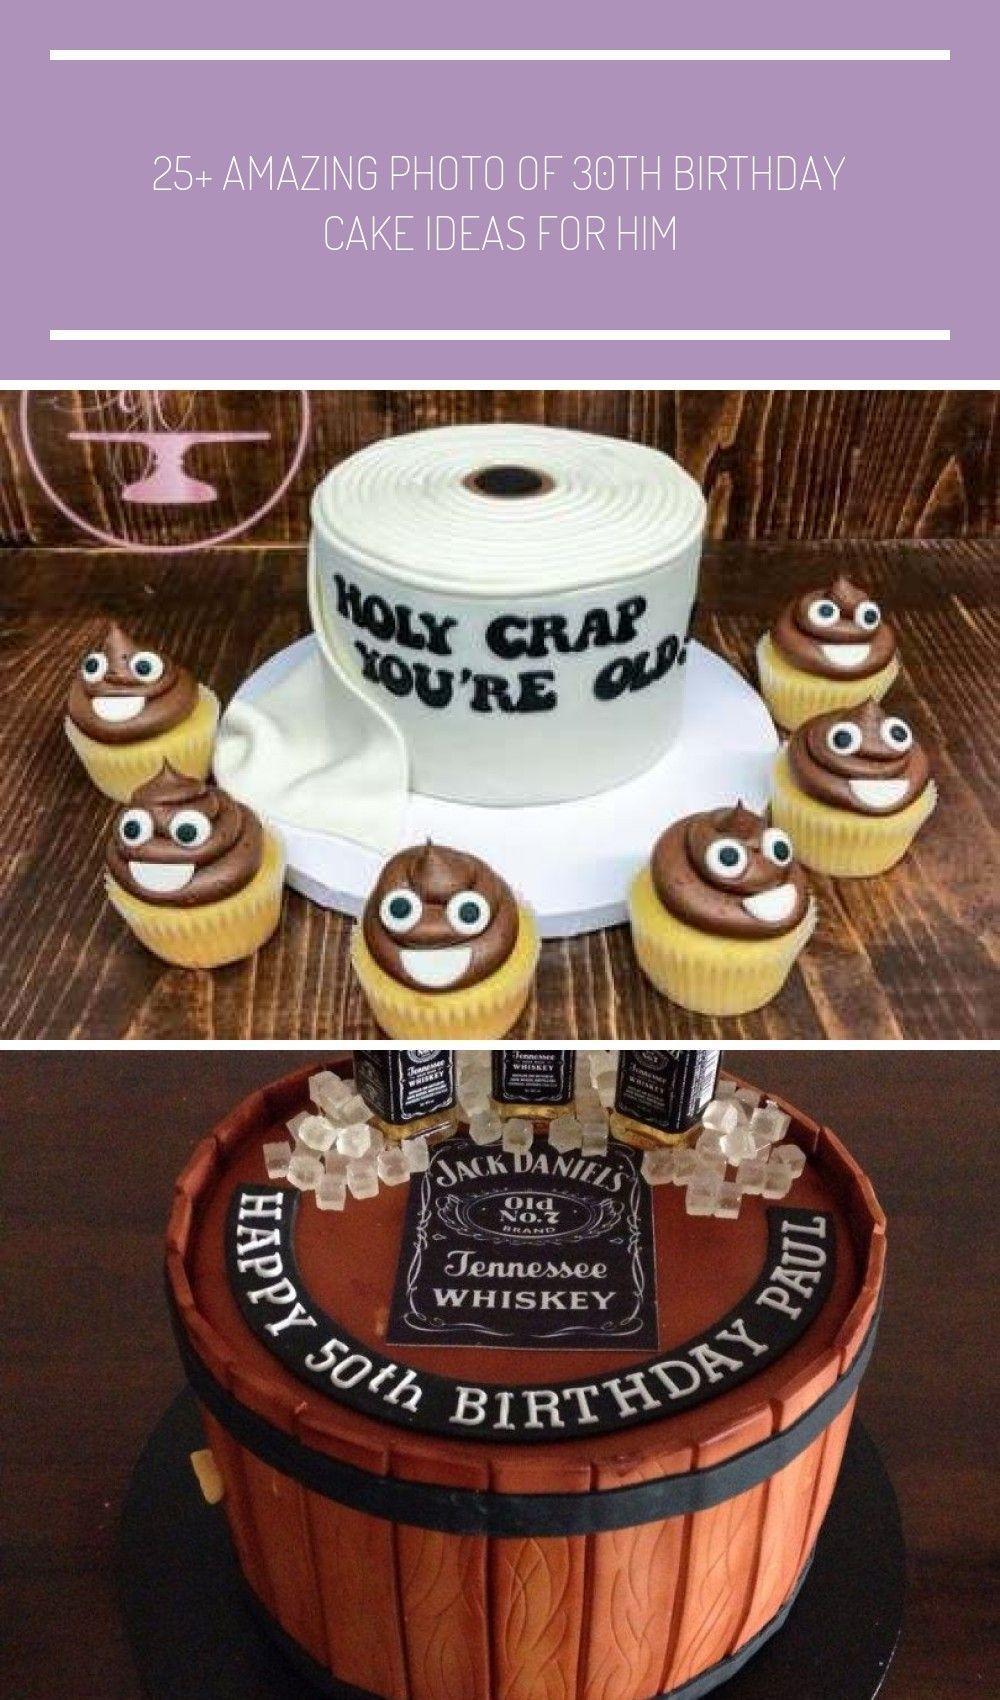 31 ideas birthday cake for men funny 60th funny cake